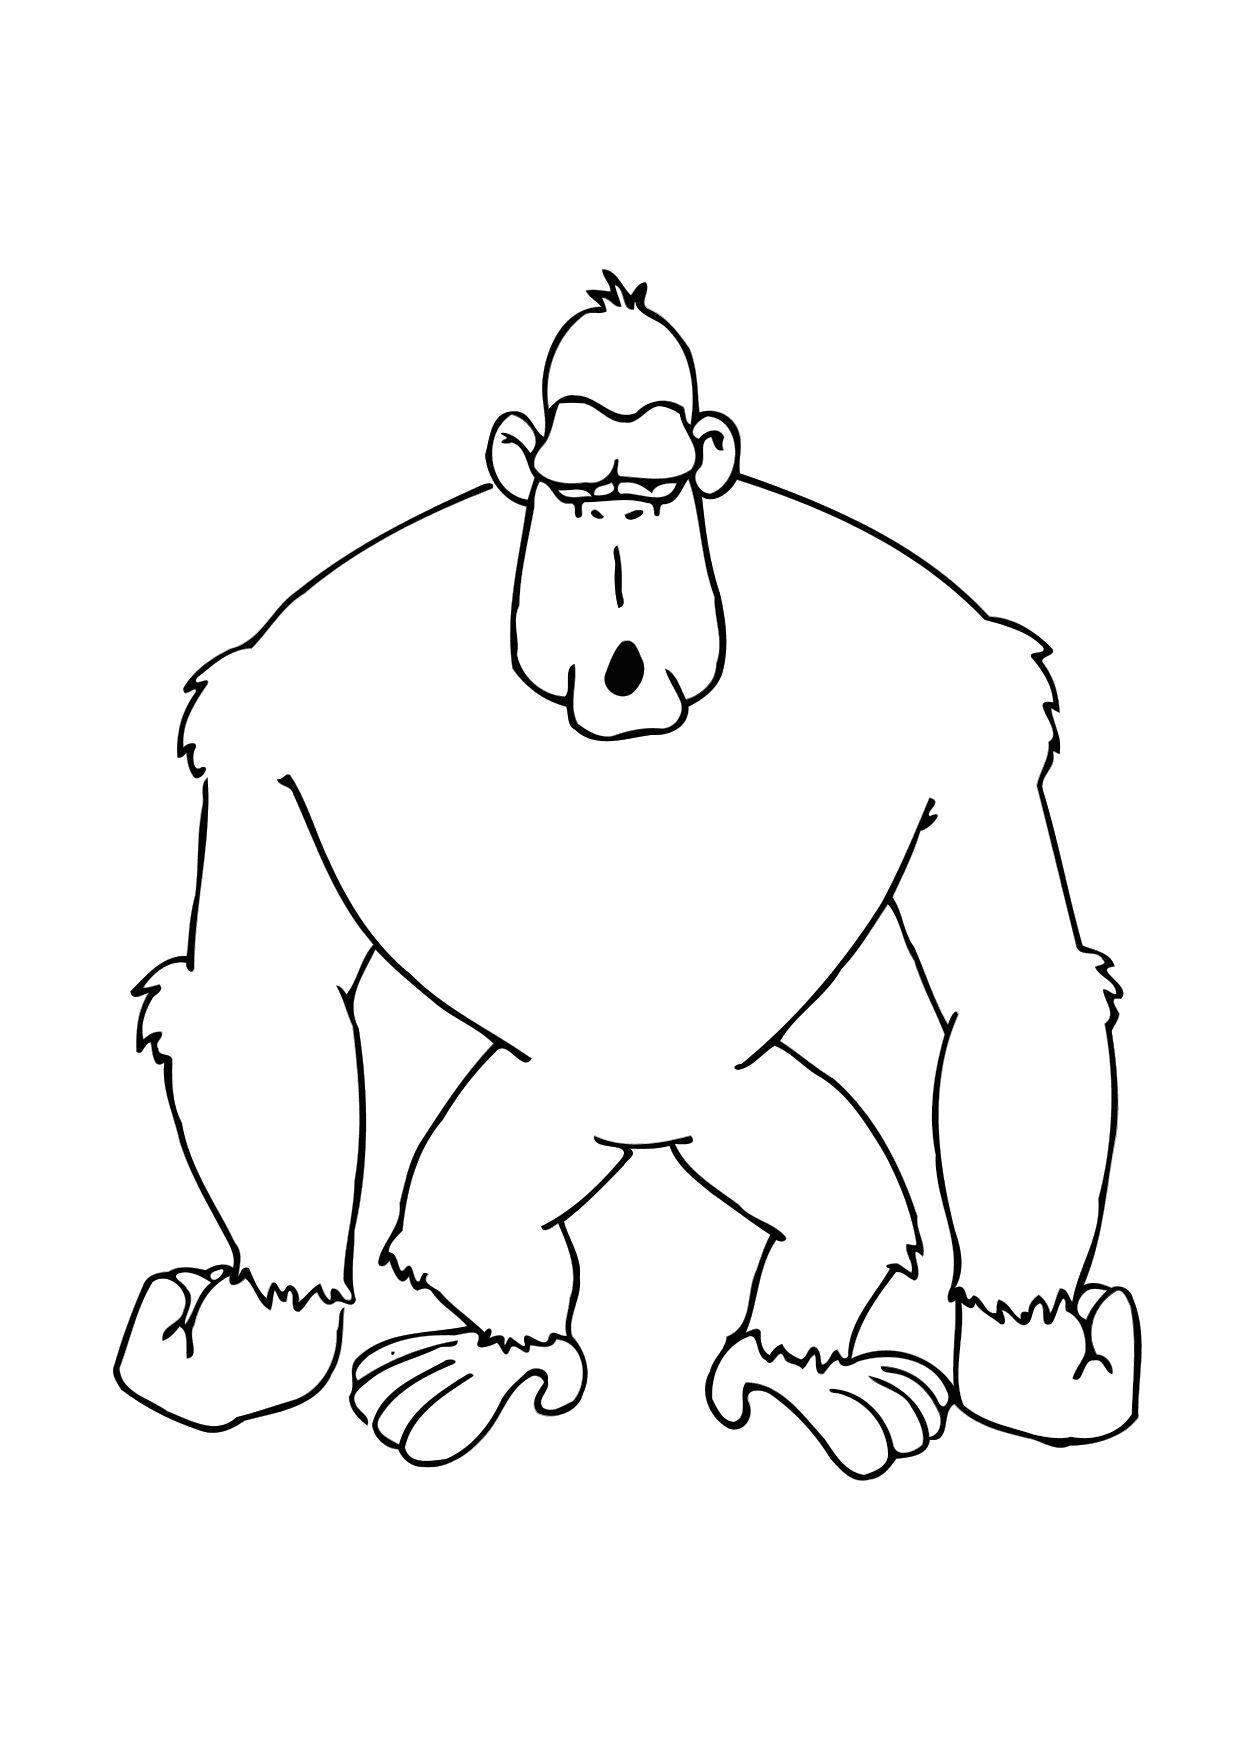 Coloriage le gorille img 11615 - Gorille coloriage ...